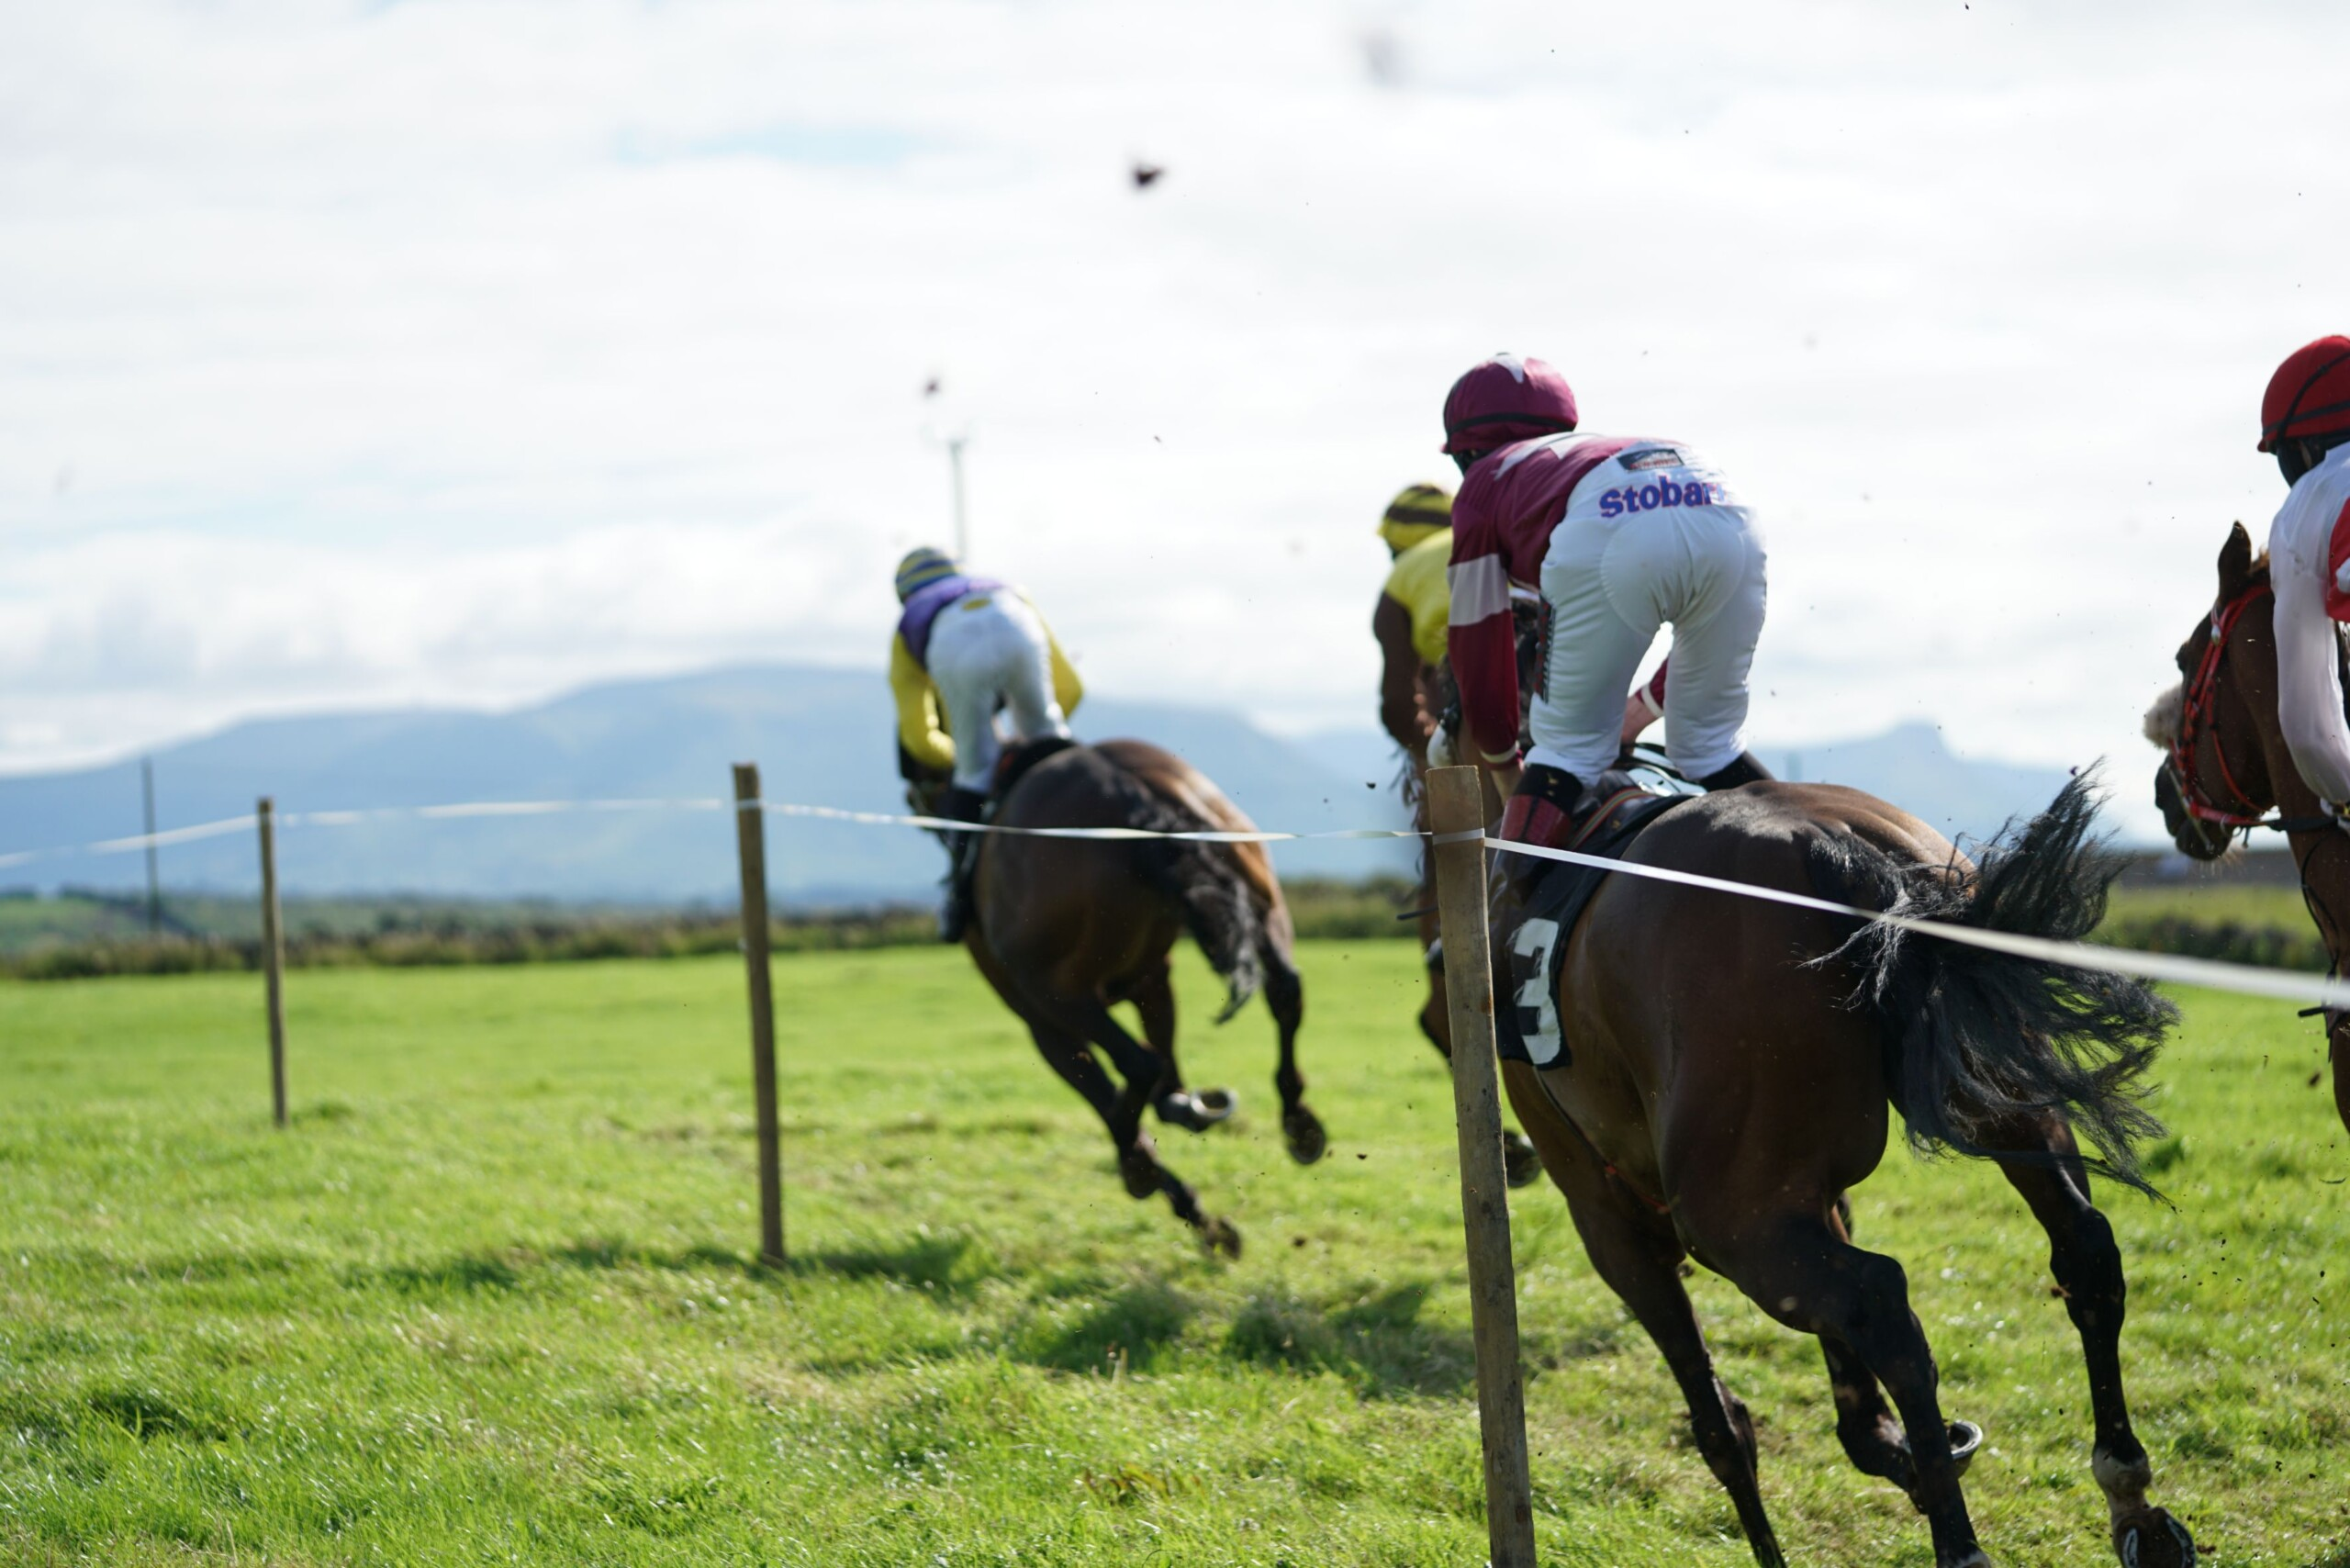 Horseracing returns to Finner